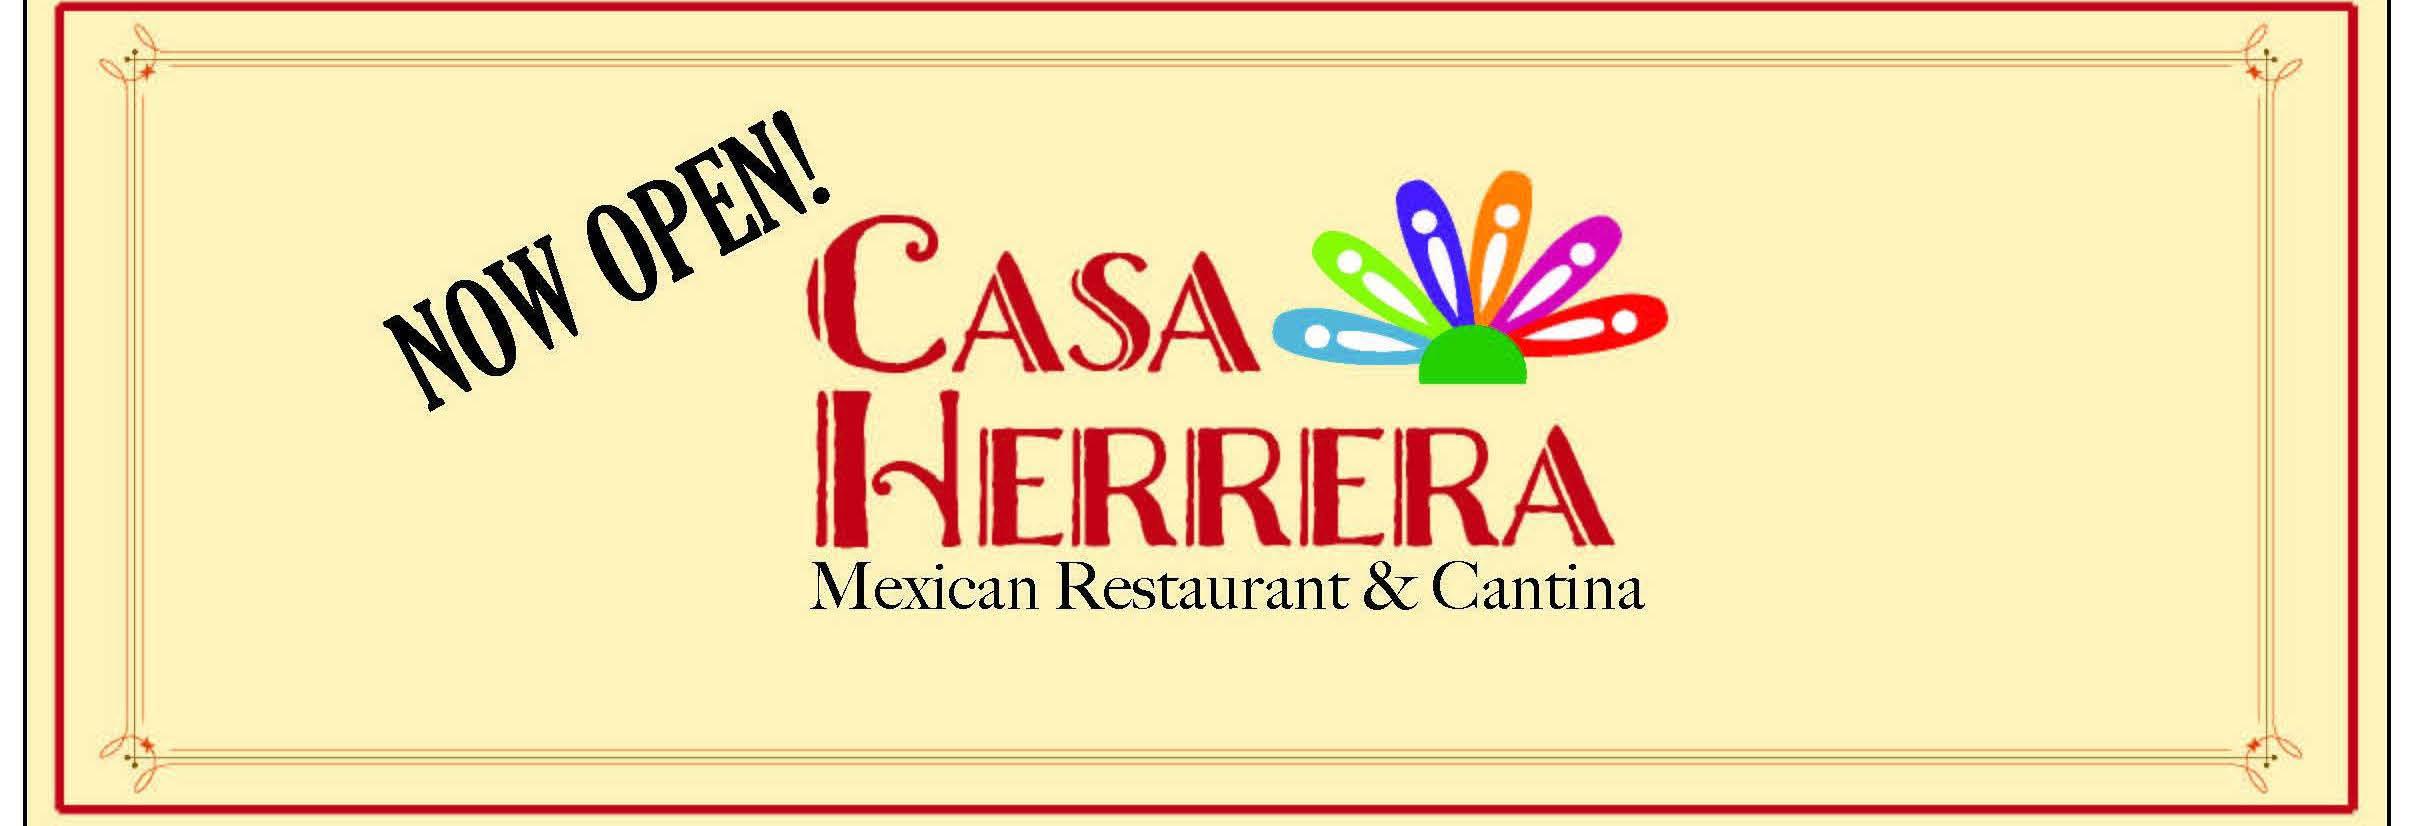 Casa Herrera Mexican Restaurant, Casa Herrera, Mexican Restaurant, Mexican near me, mexican valpak